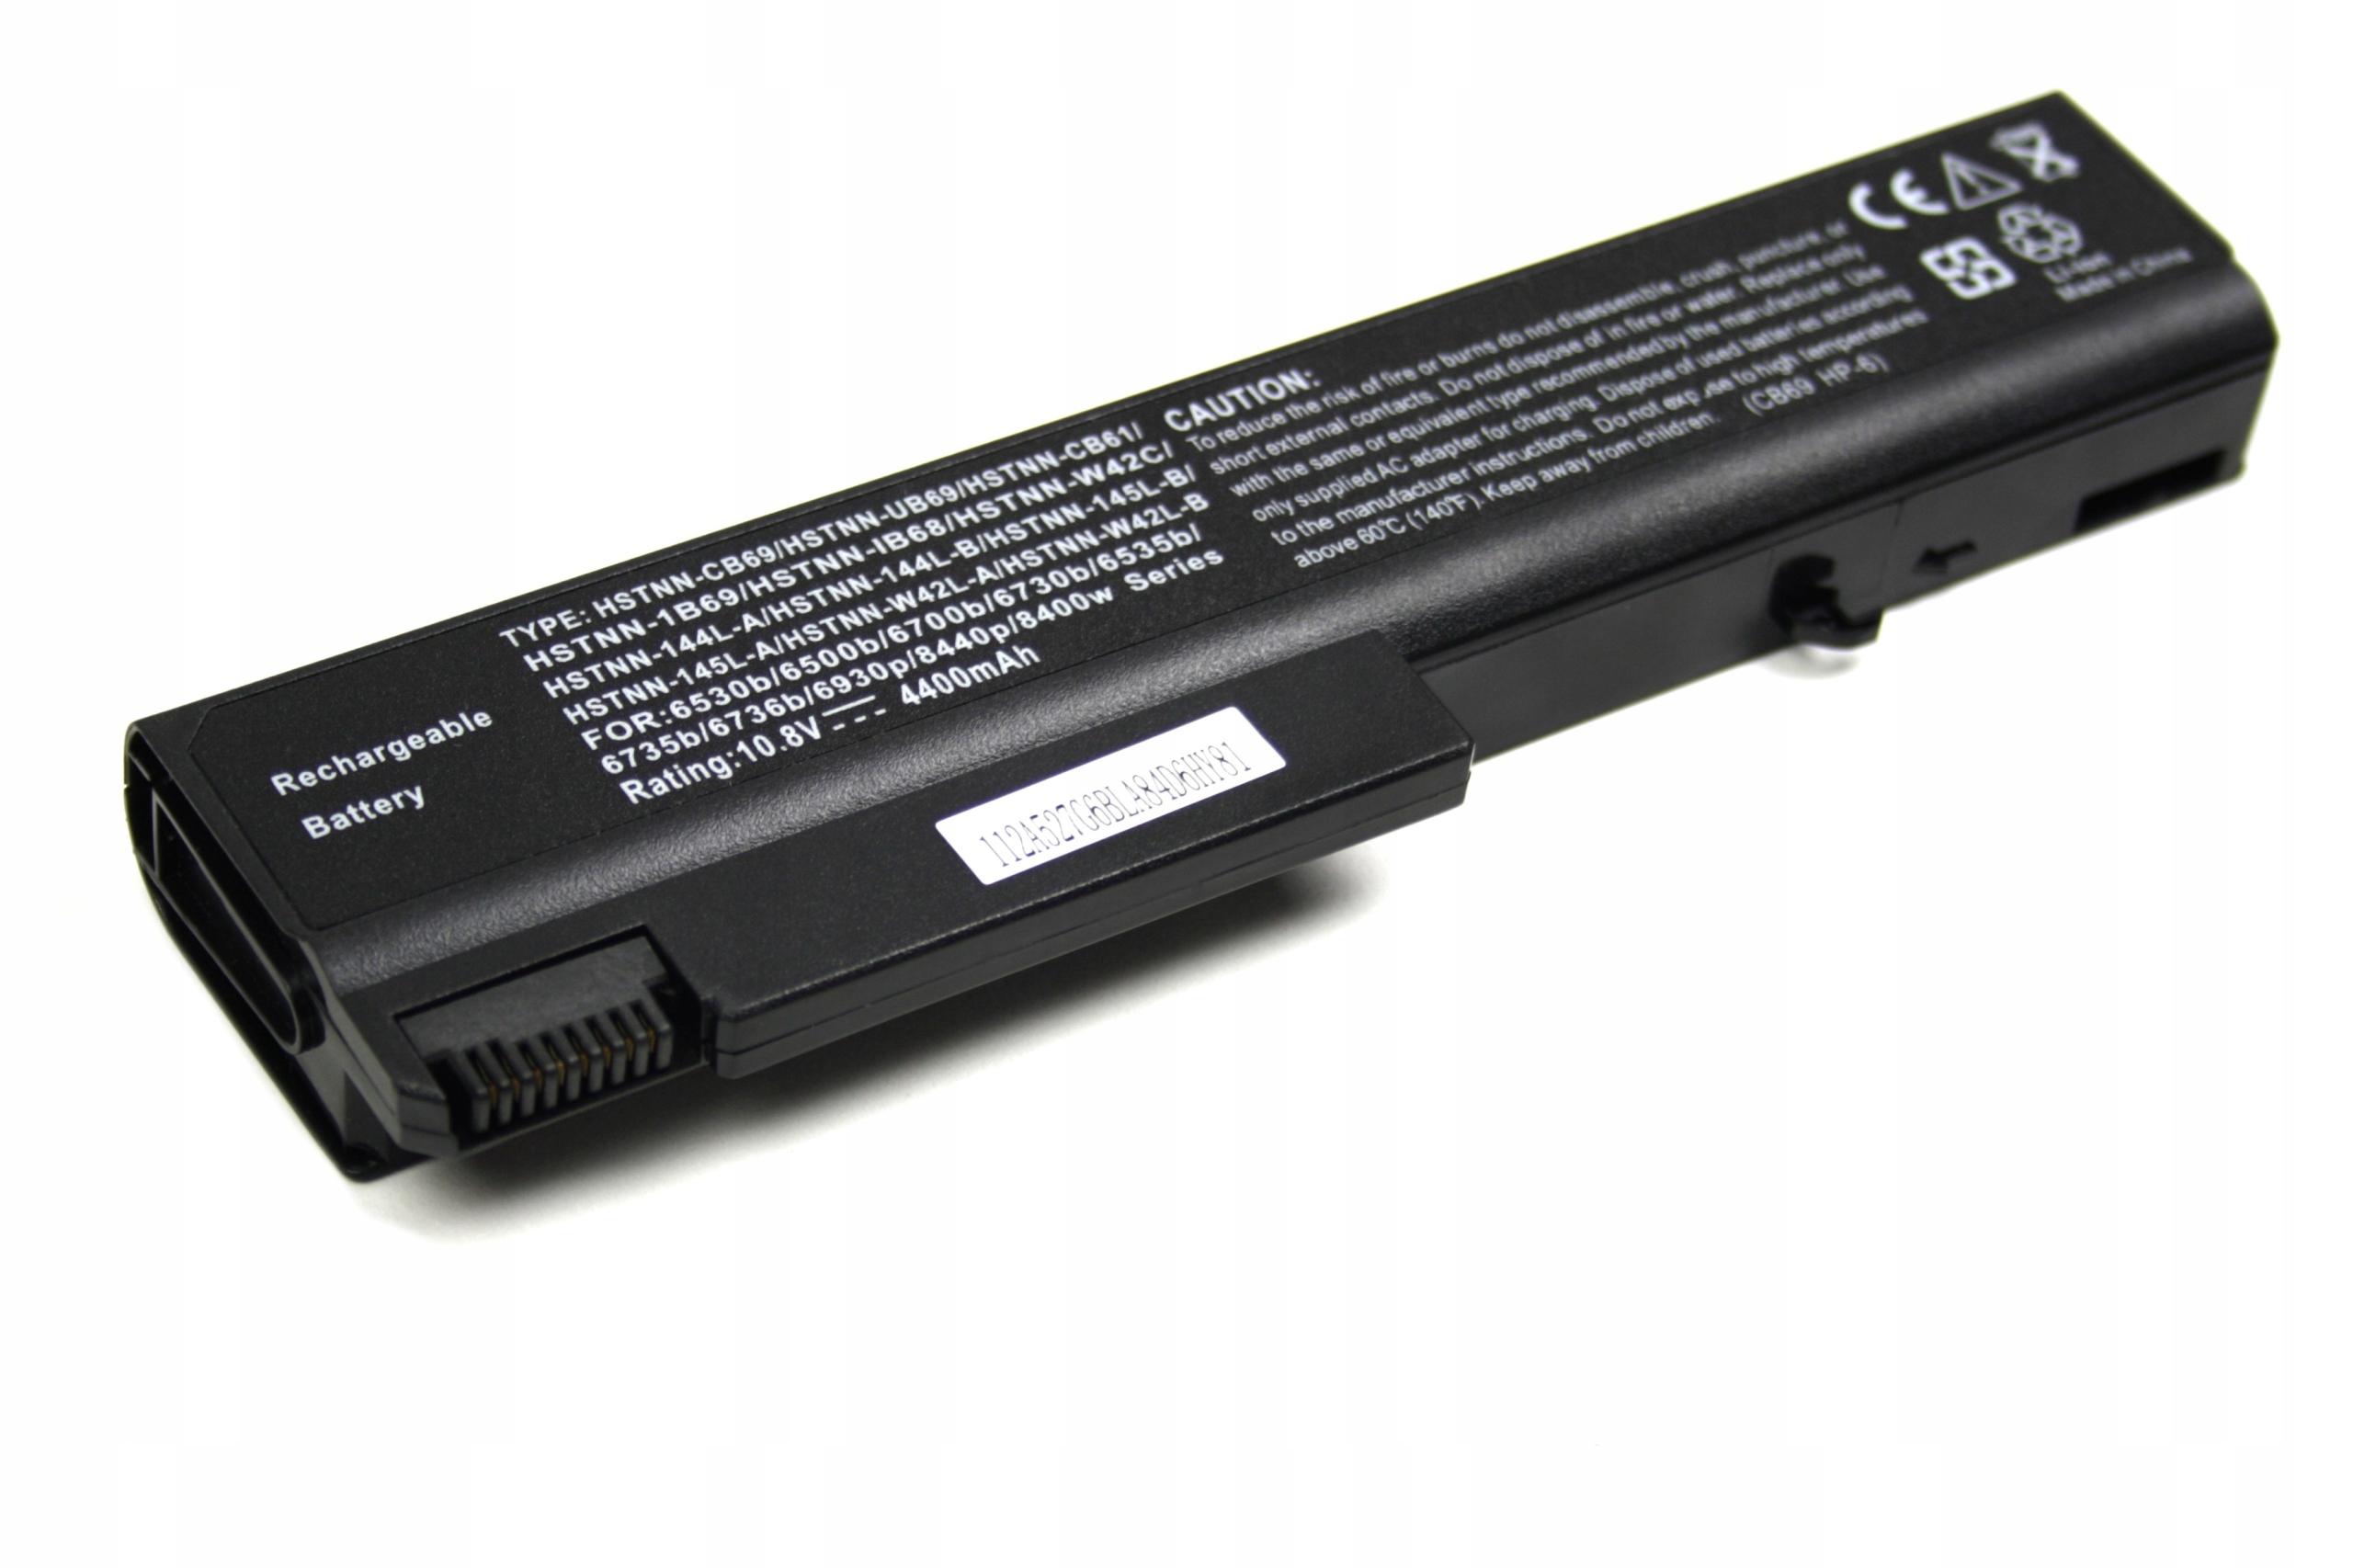 BATERIA AKUMULATOR HP ELITEBOOK 6930P 8440P PROBOOK 6550B - Baterie do laptopów